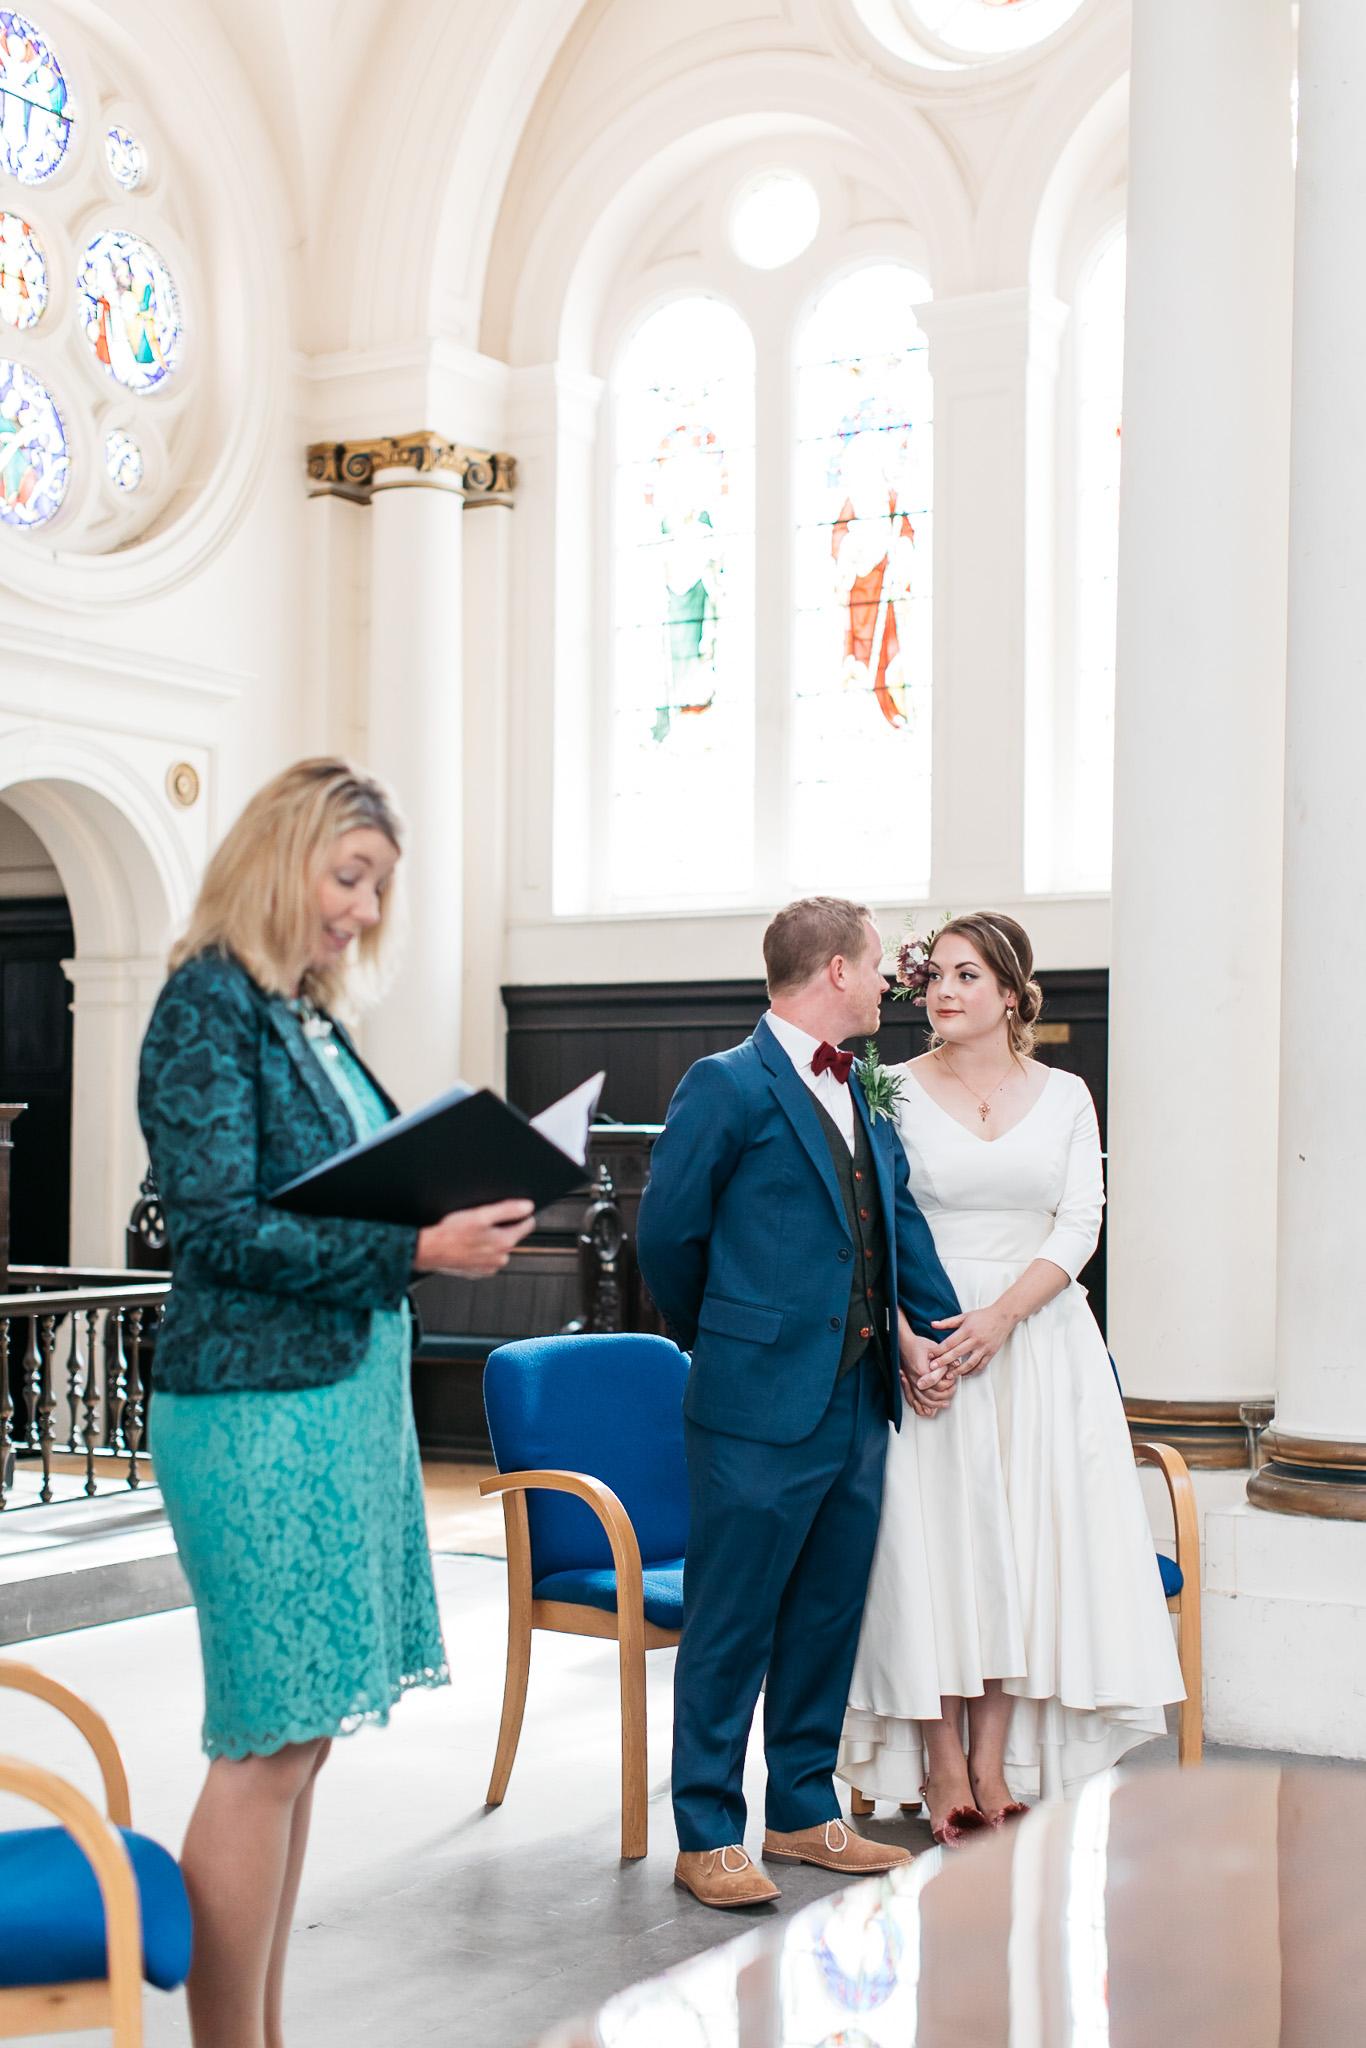 st_andrews_fabrica_brighton_wedding_553.jpg